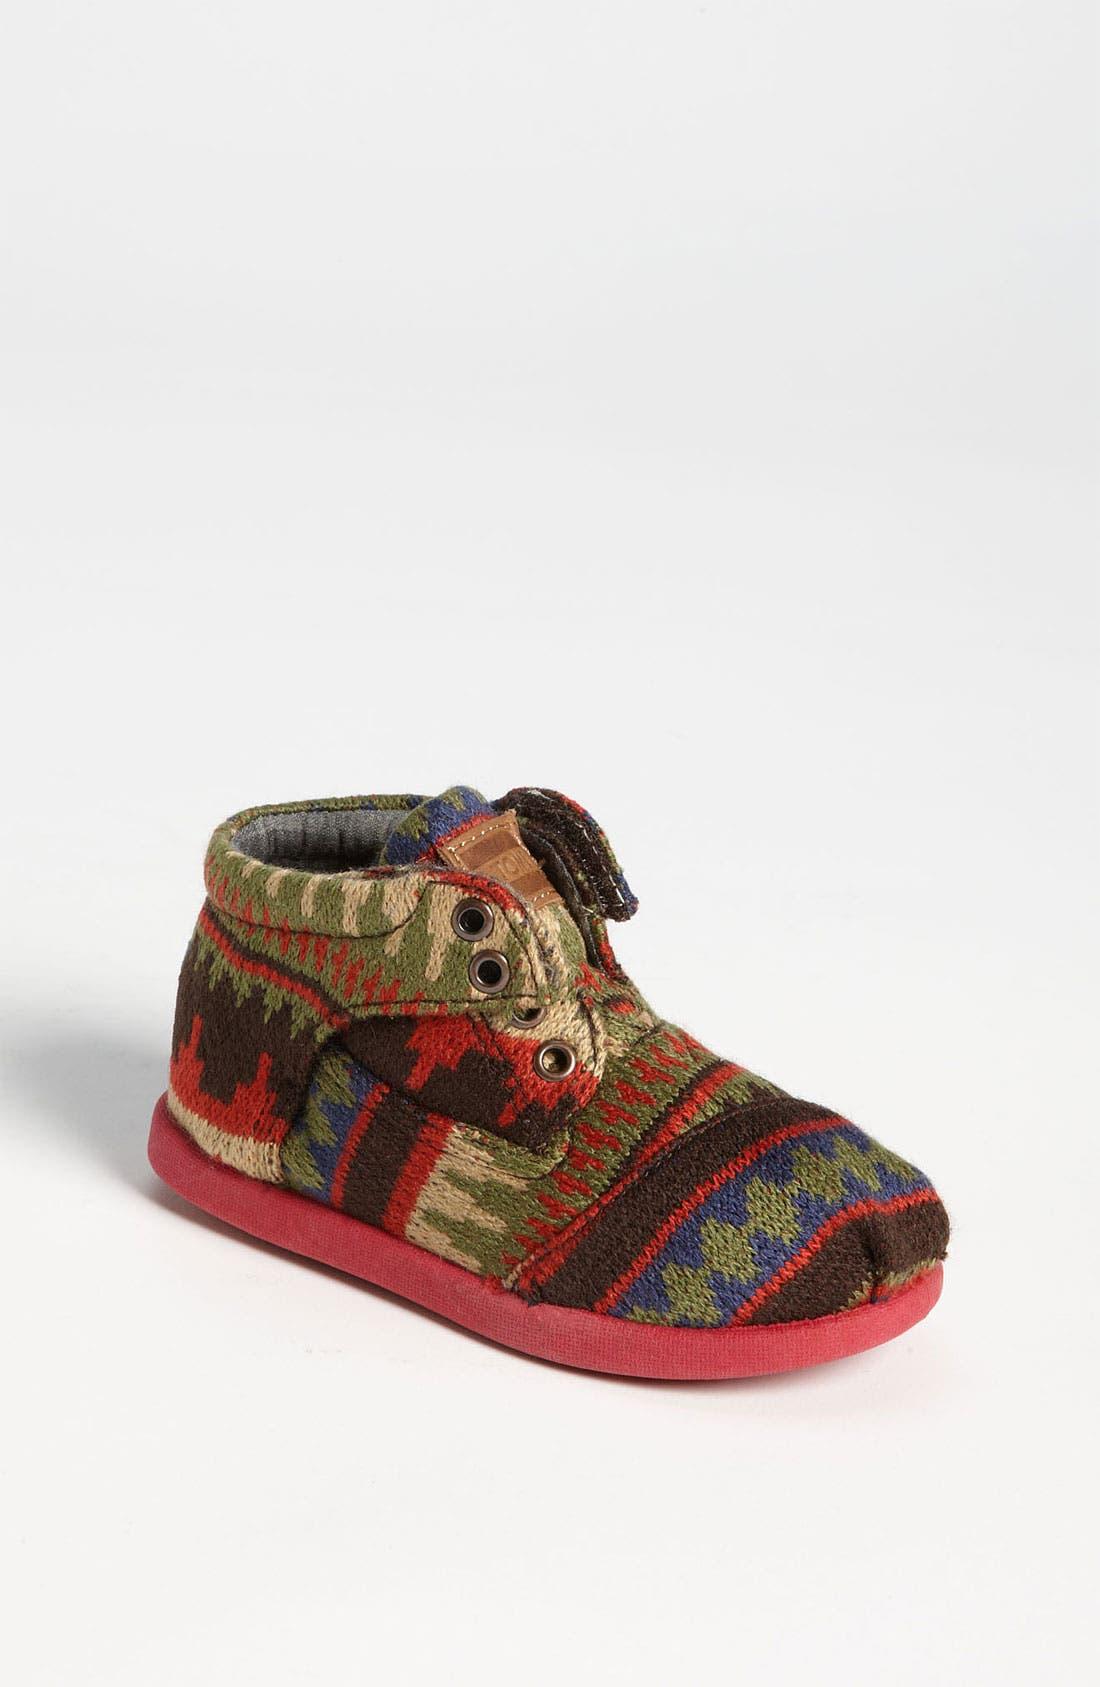 Alternate Image 1 Selected - TOMS 'Botas Tiny - Kilim' Boot (Baby, Walker & Toddler)